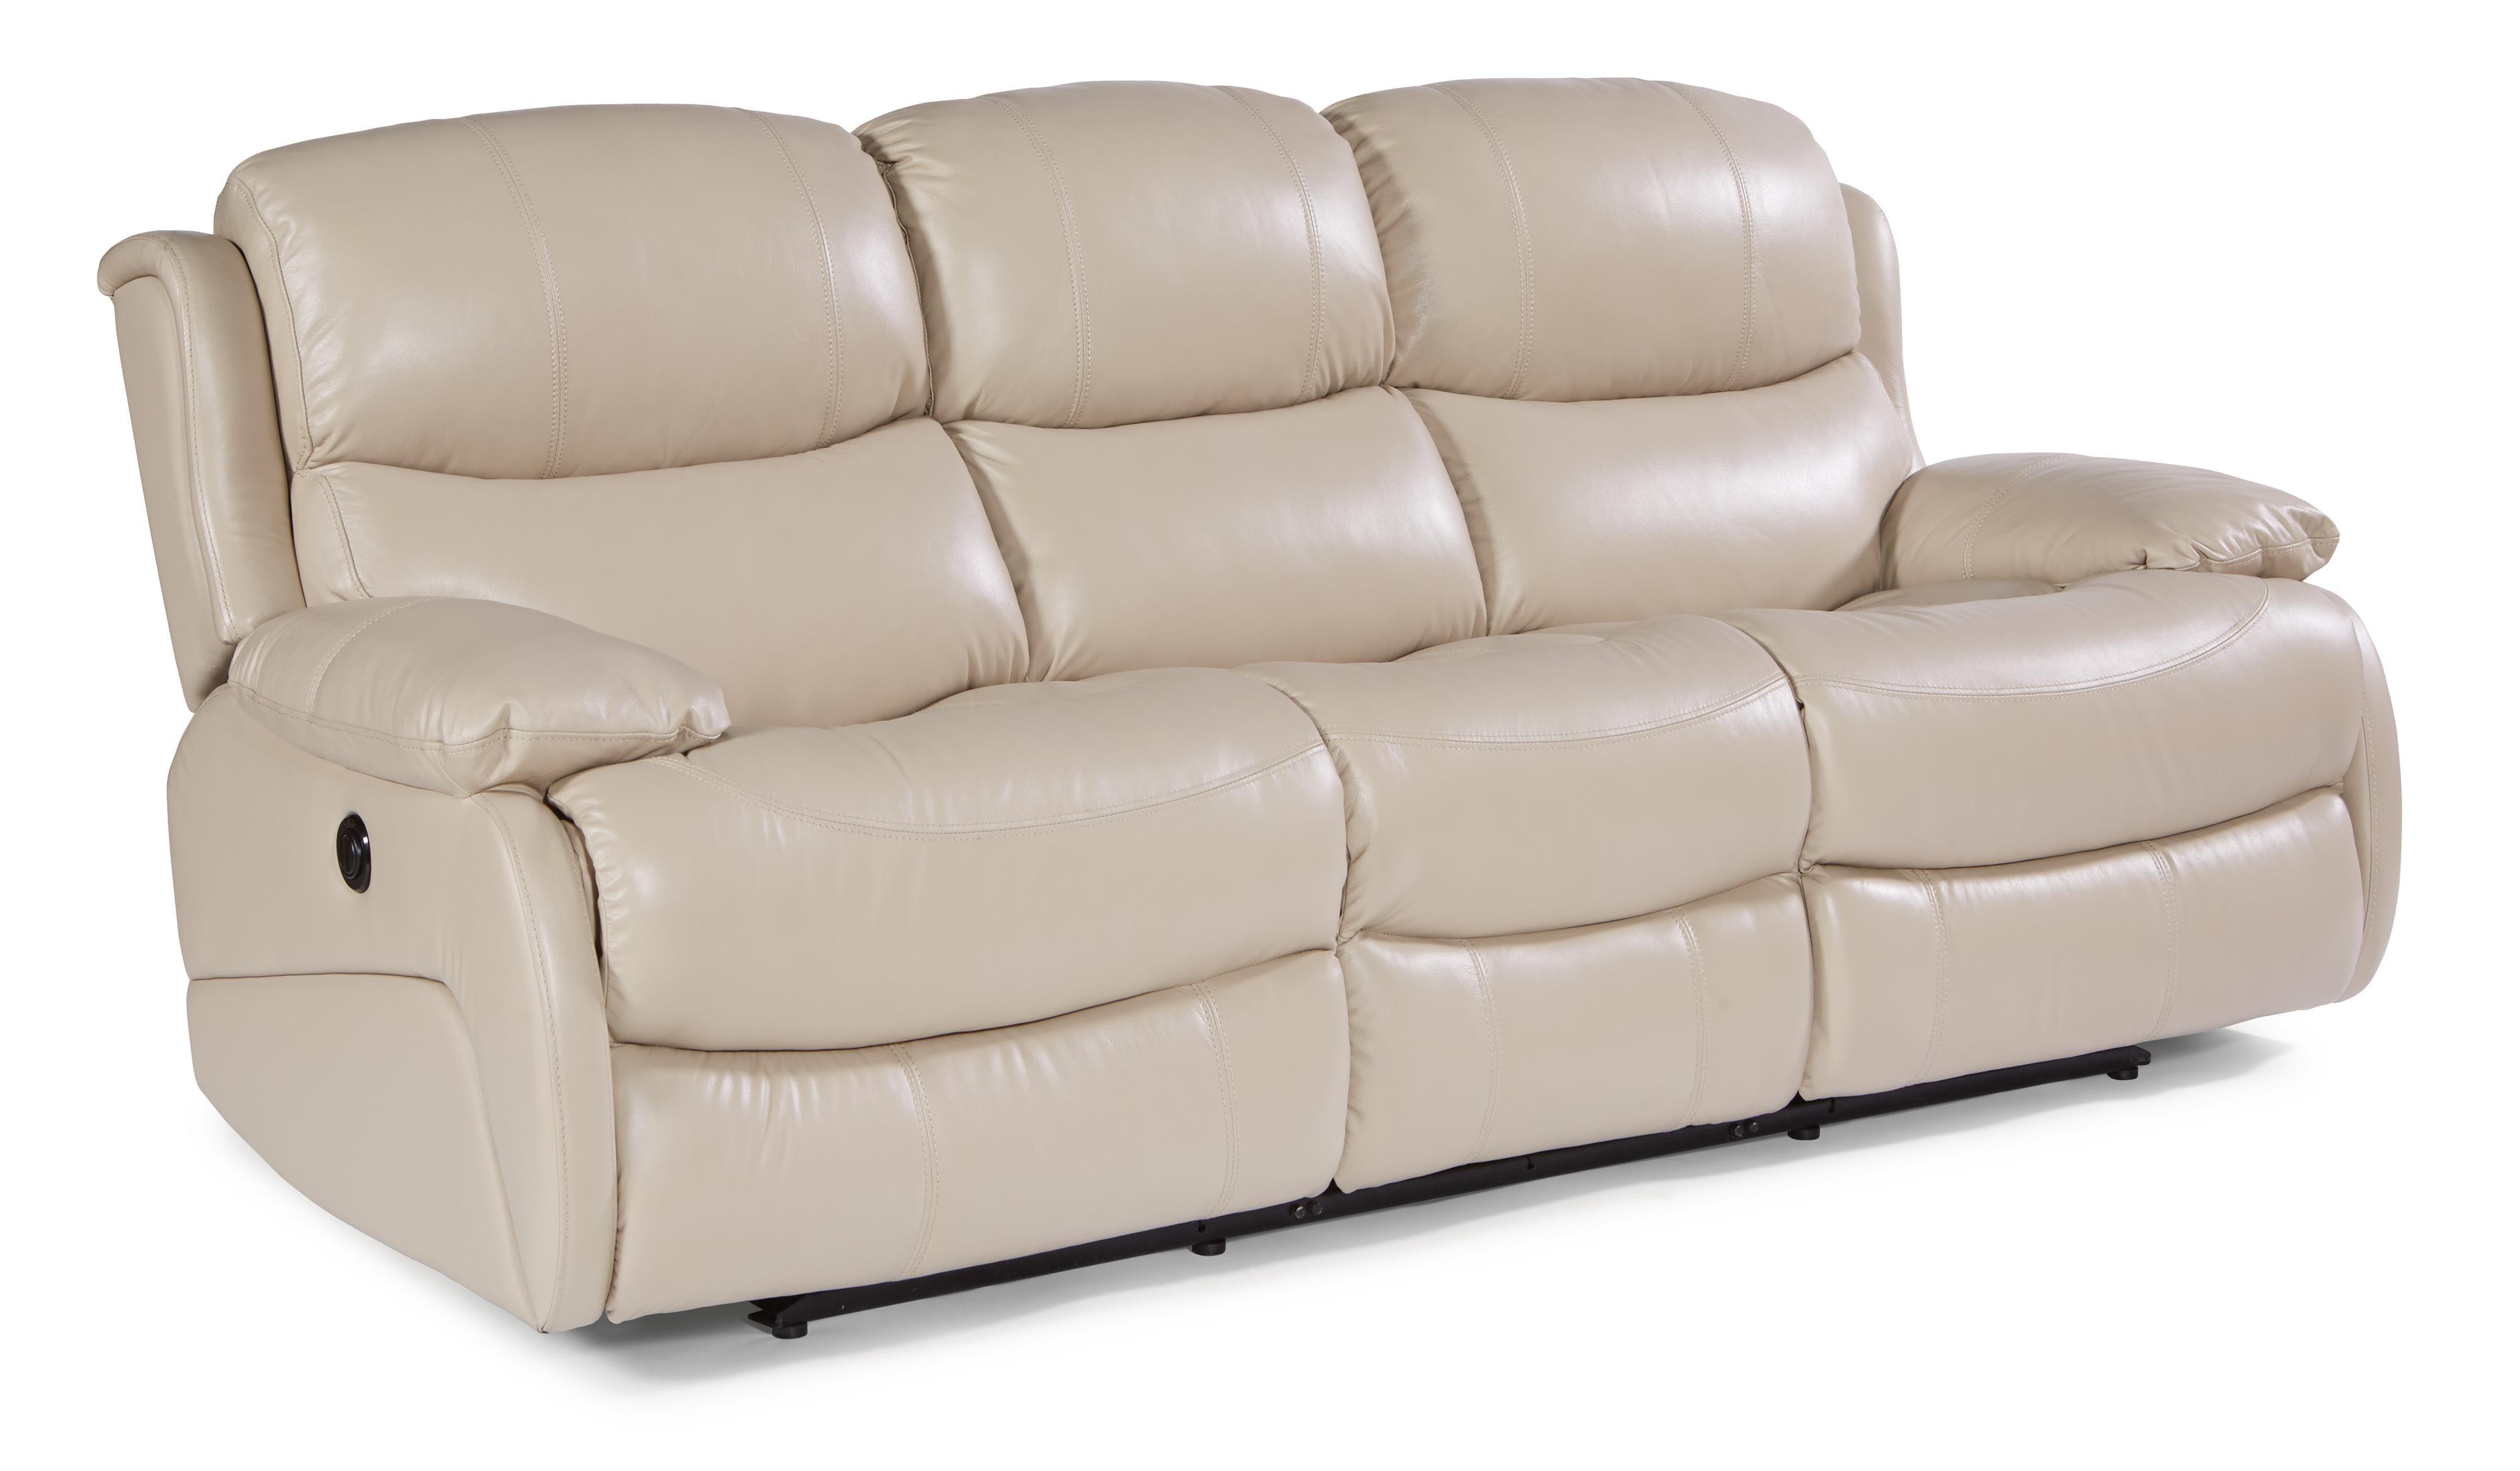 double reclining leather sofa pallet diy plans flexsteel latitudes amsterdam power